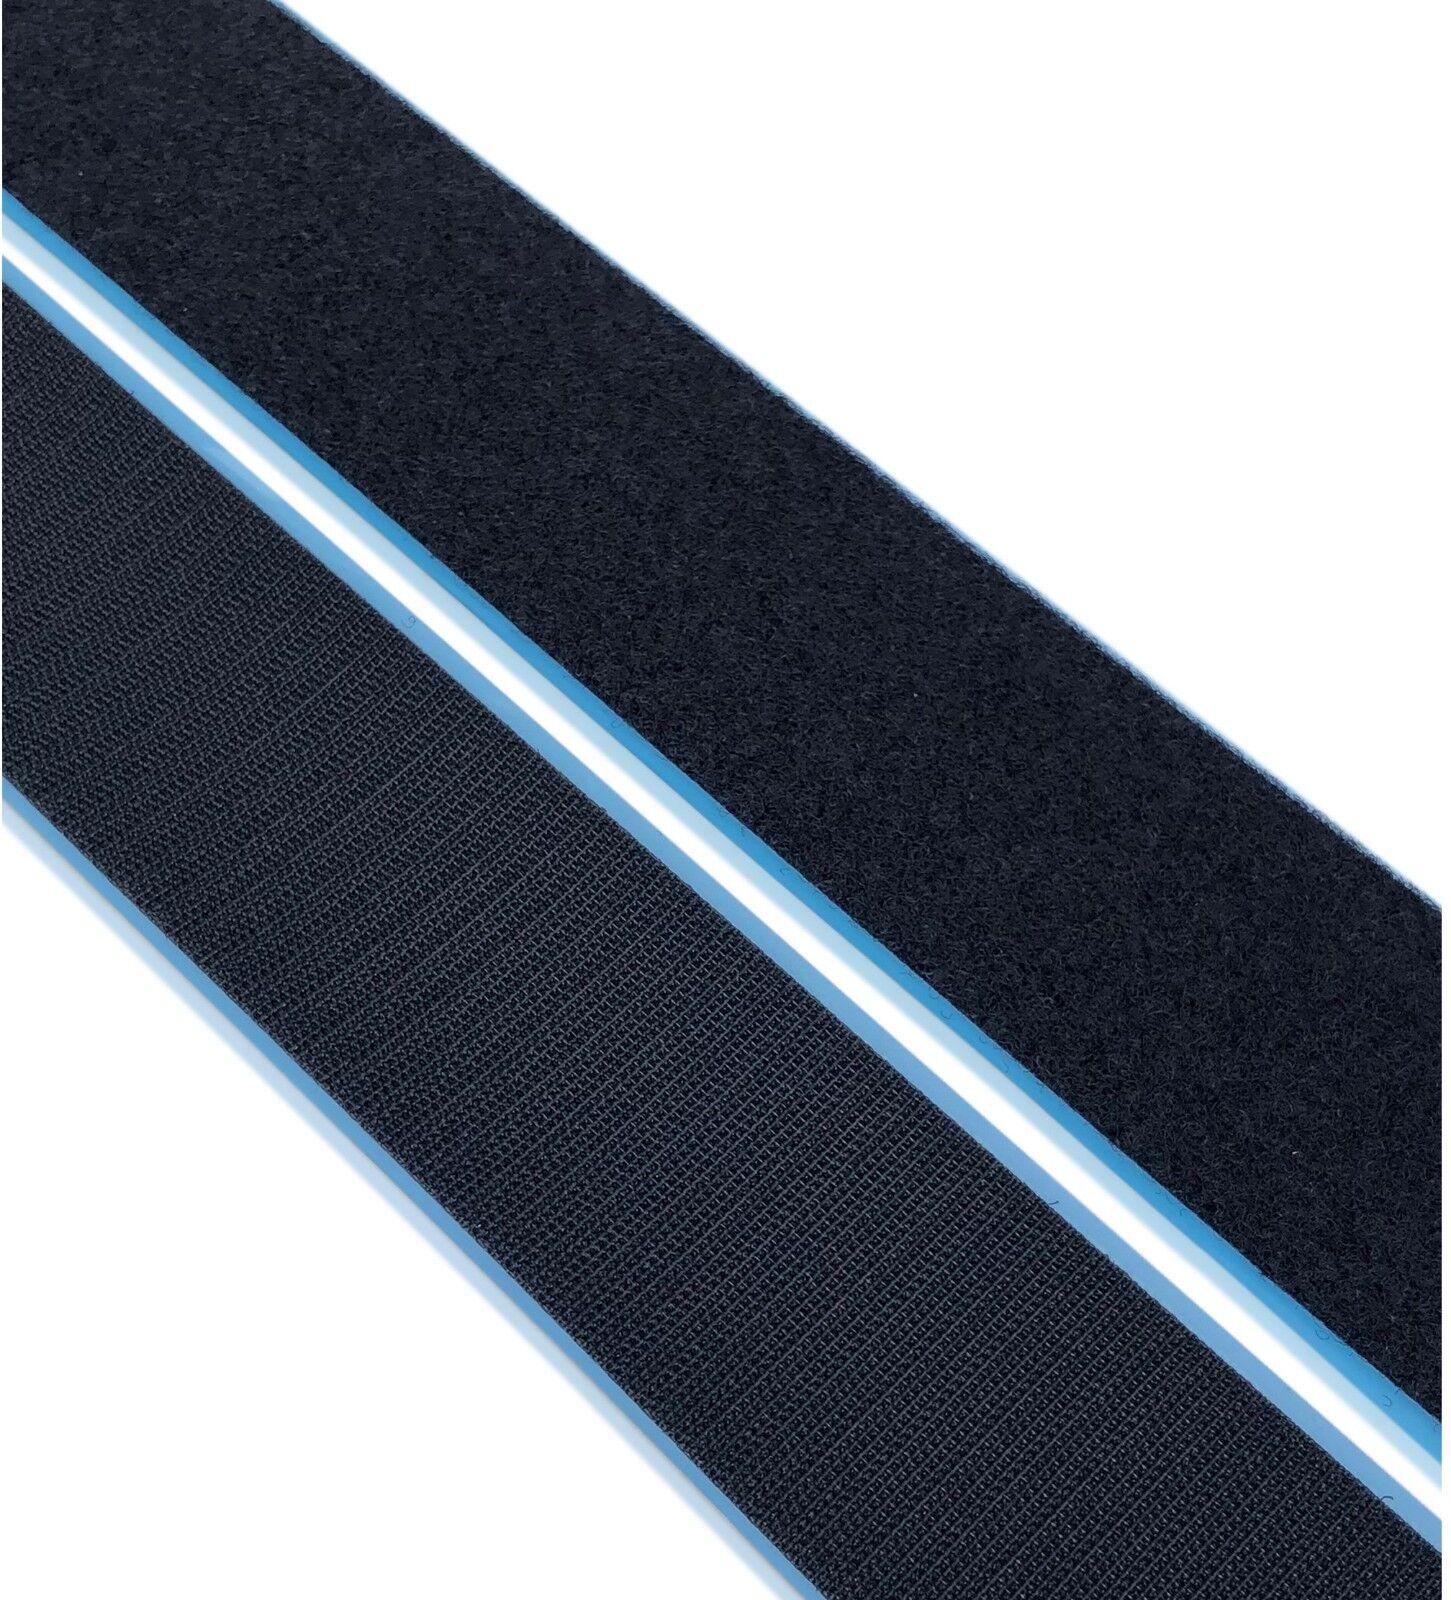 QUALITY 13mm x 25m BLACK LONG HOOK /& LOOP WRAP Tape Cable Fastener Underwater